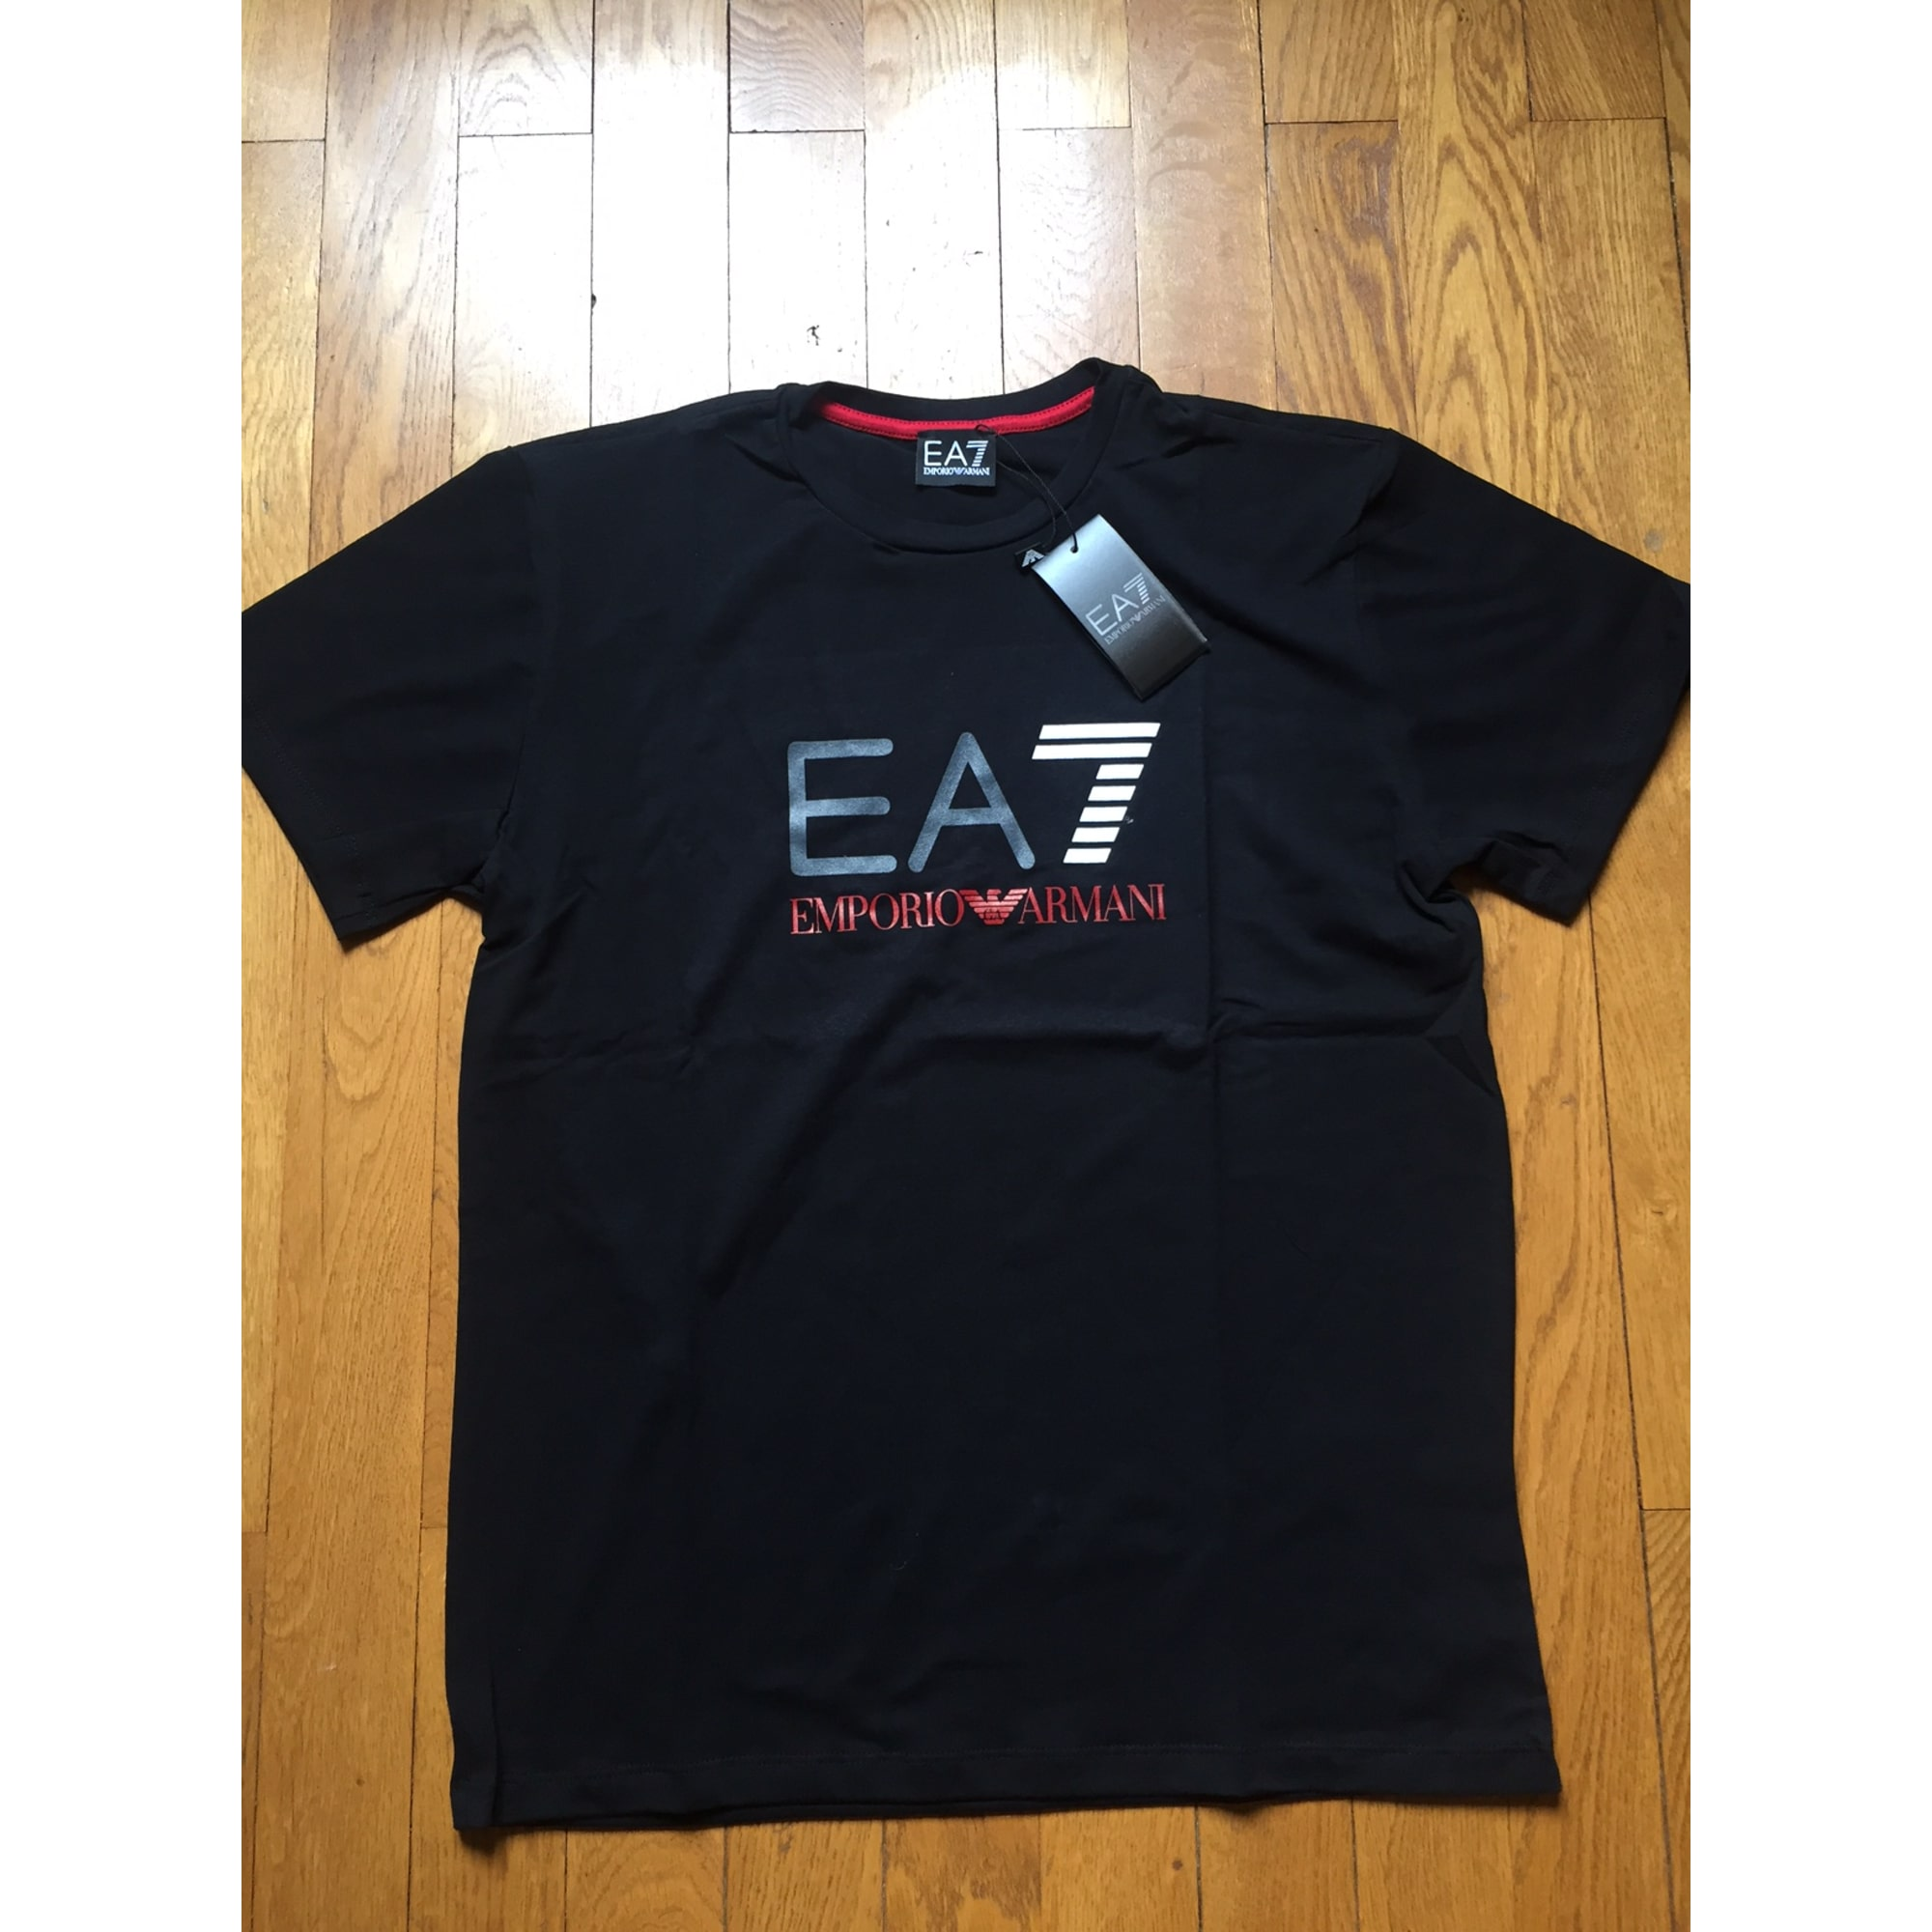 Tee-shirt ARMANI EA7 3 (L) noir vendu par Jujulelyonnais - 5516858 0fadbeb4b3a